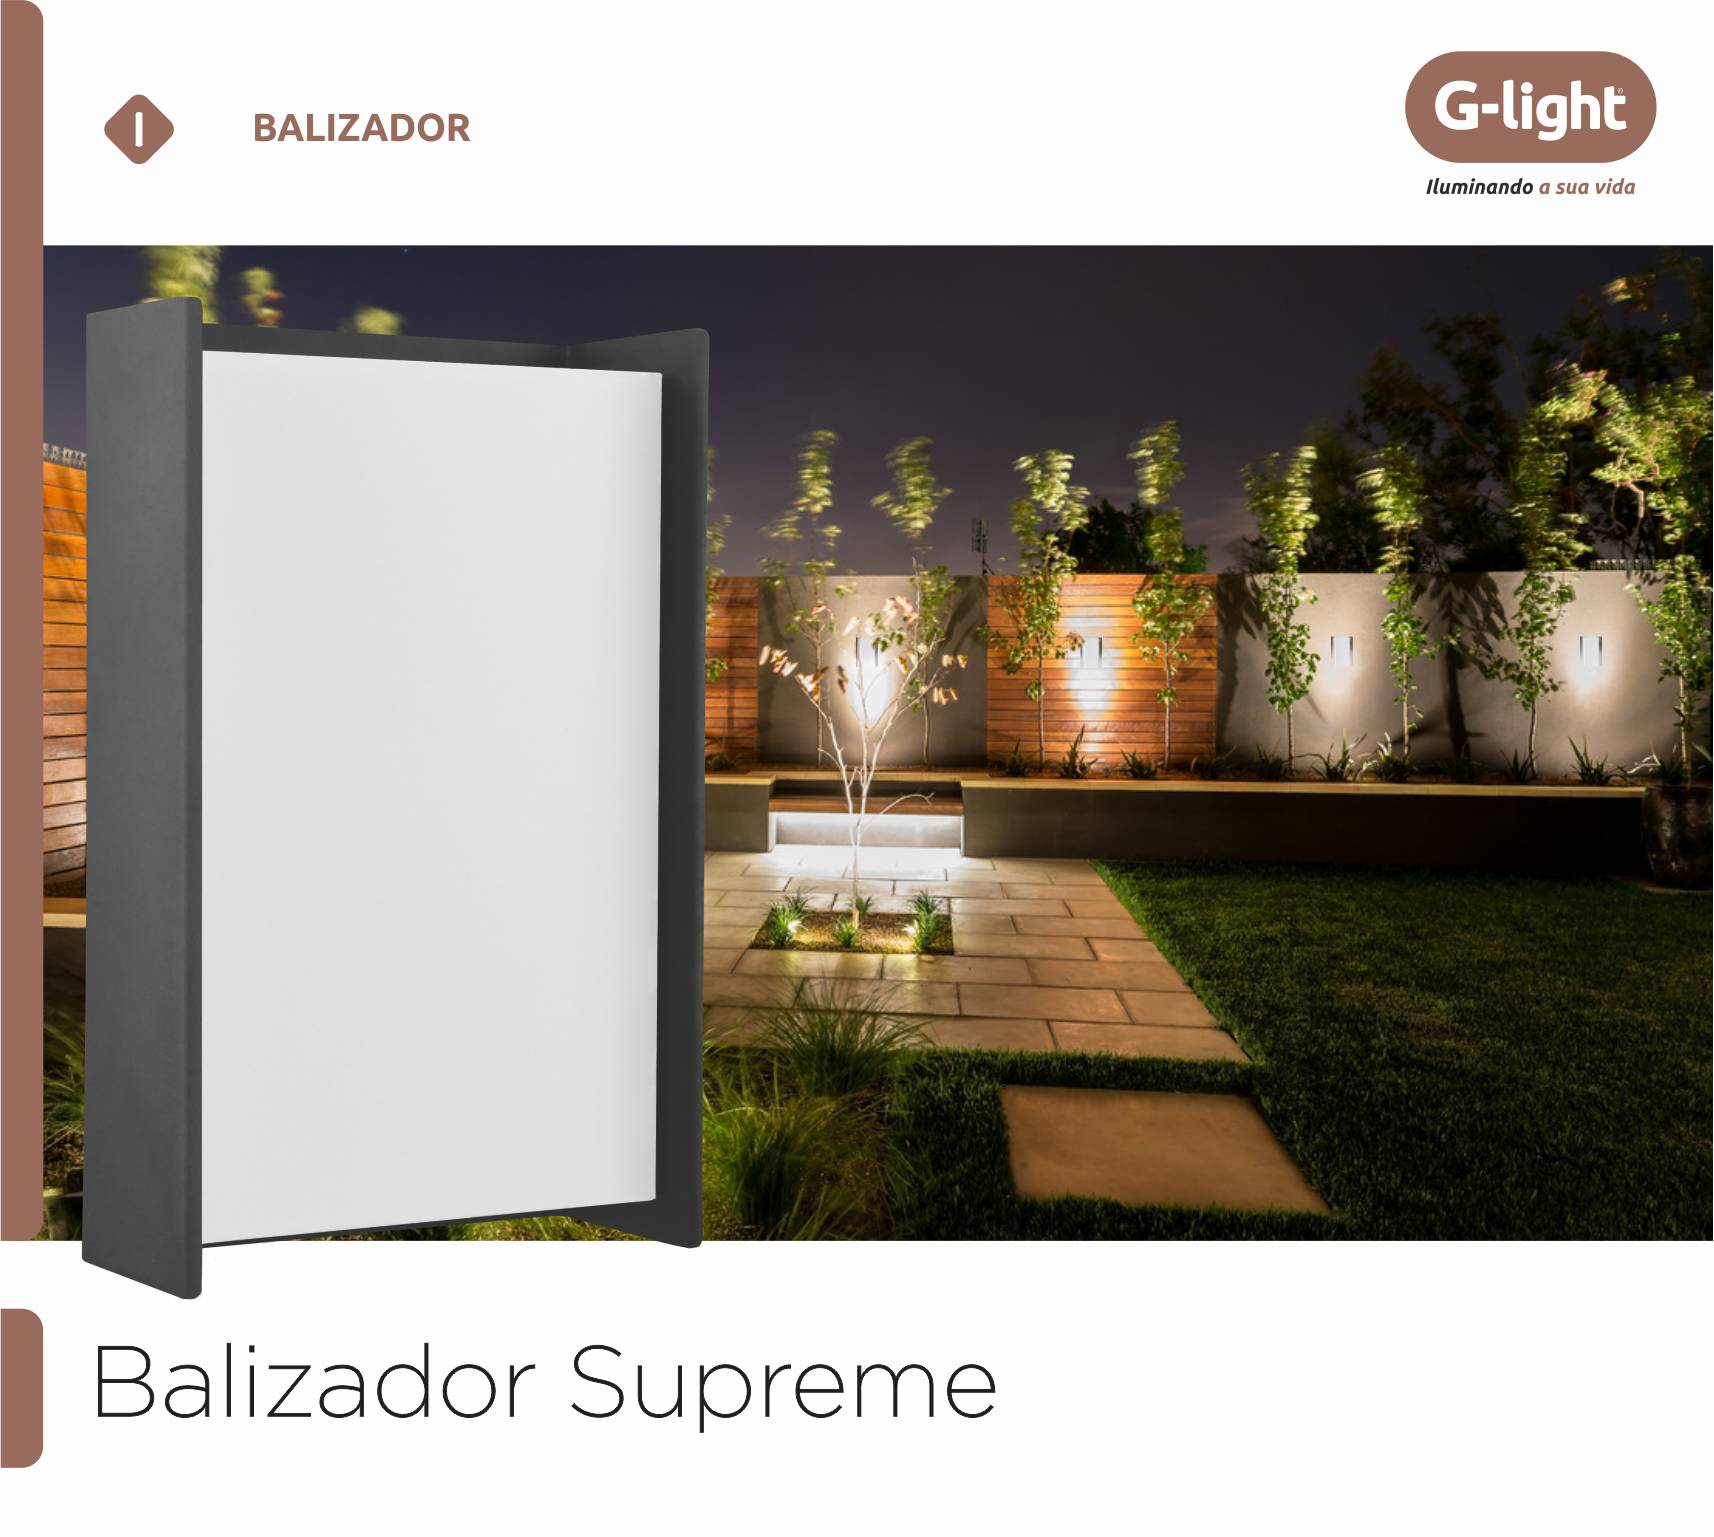 Balizador Supreme